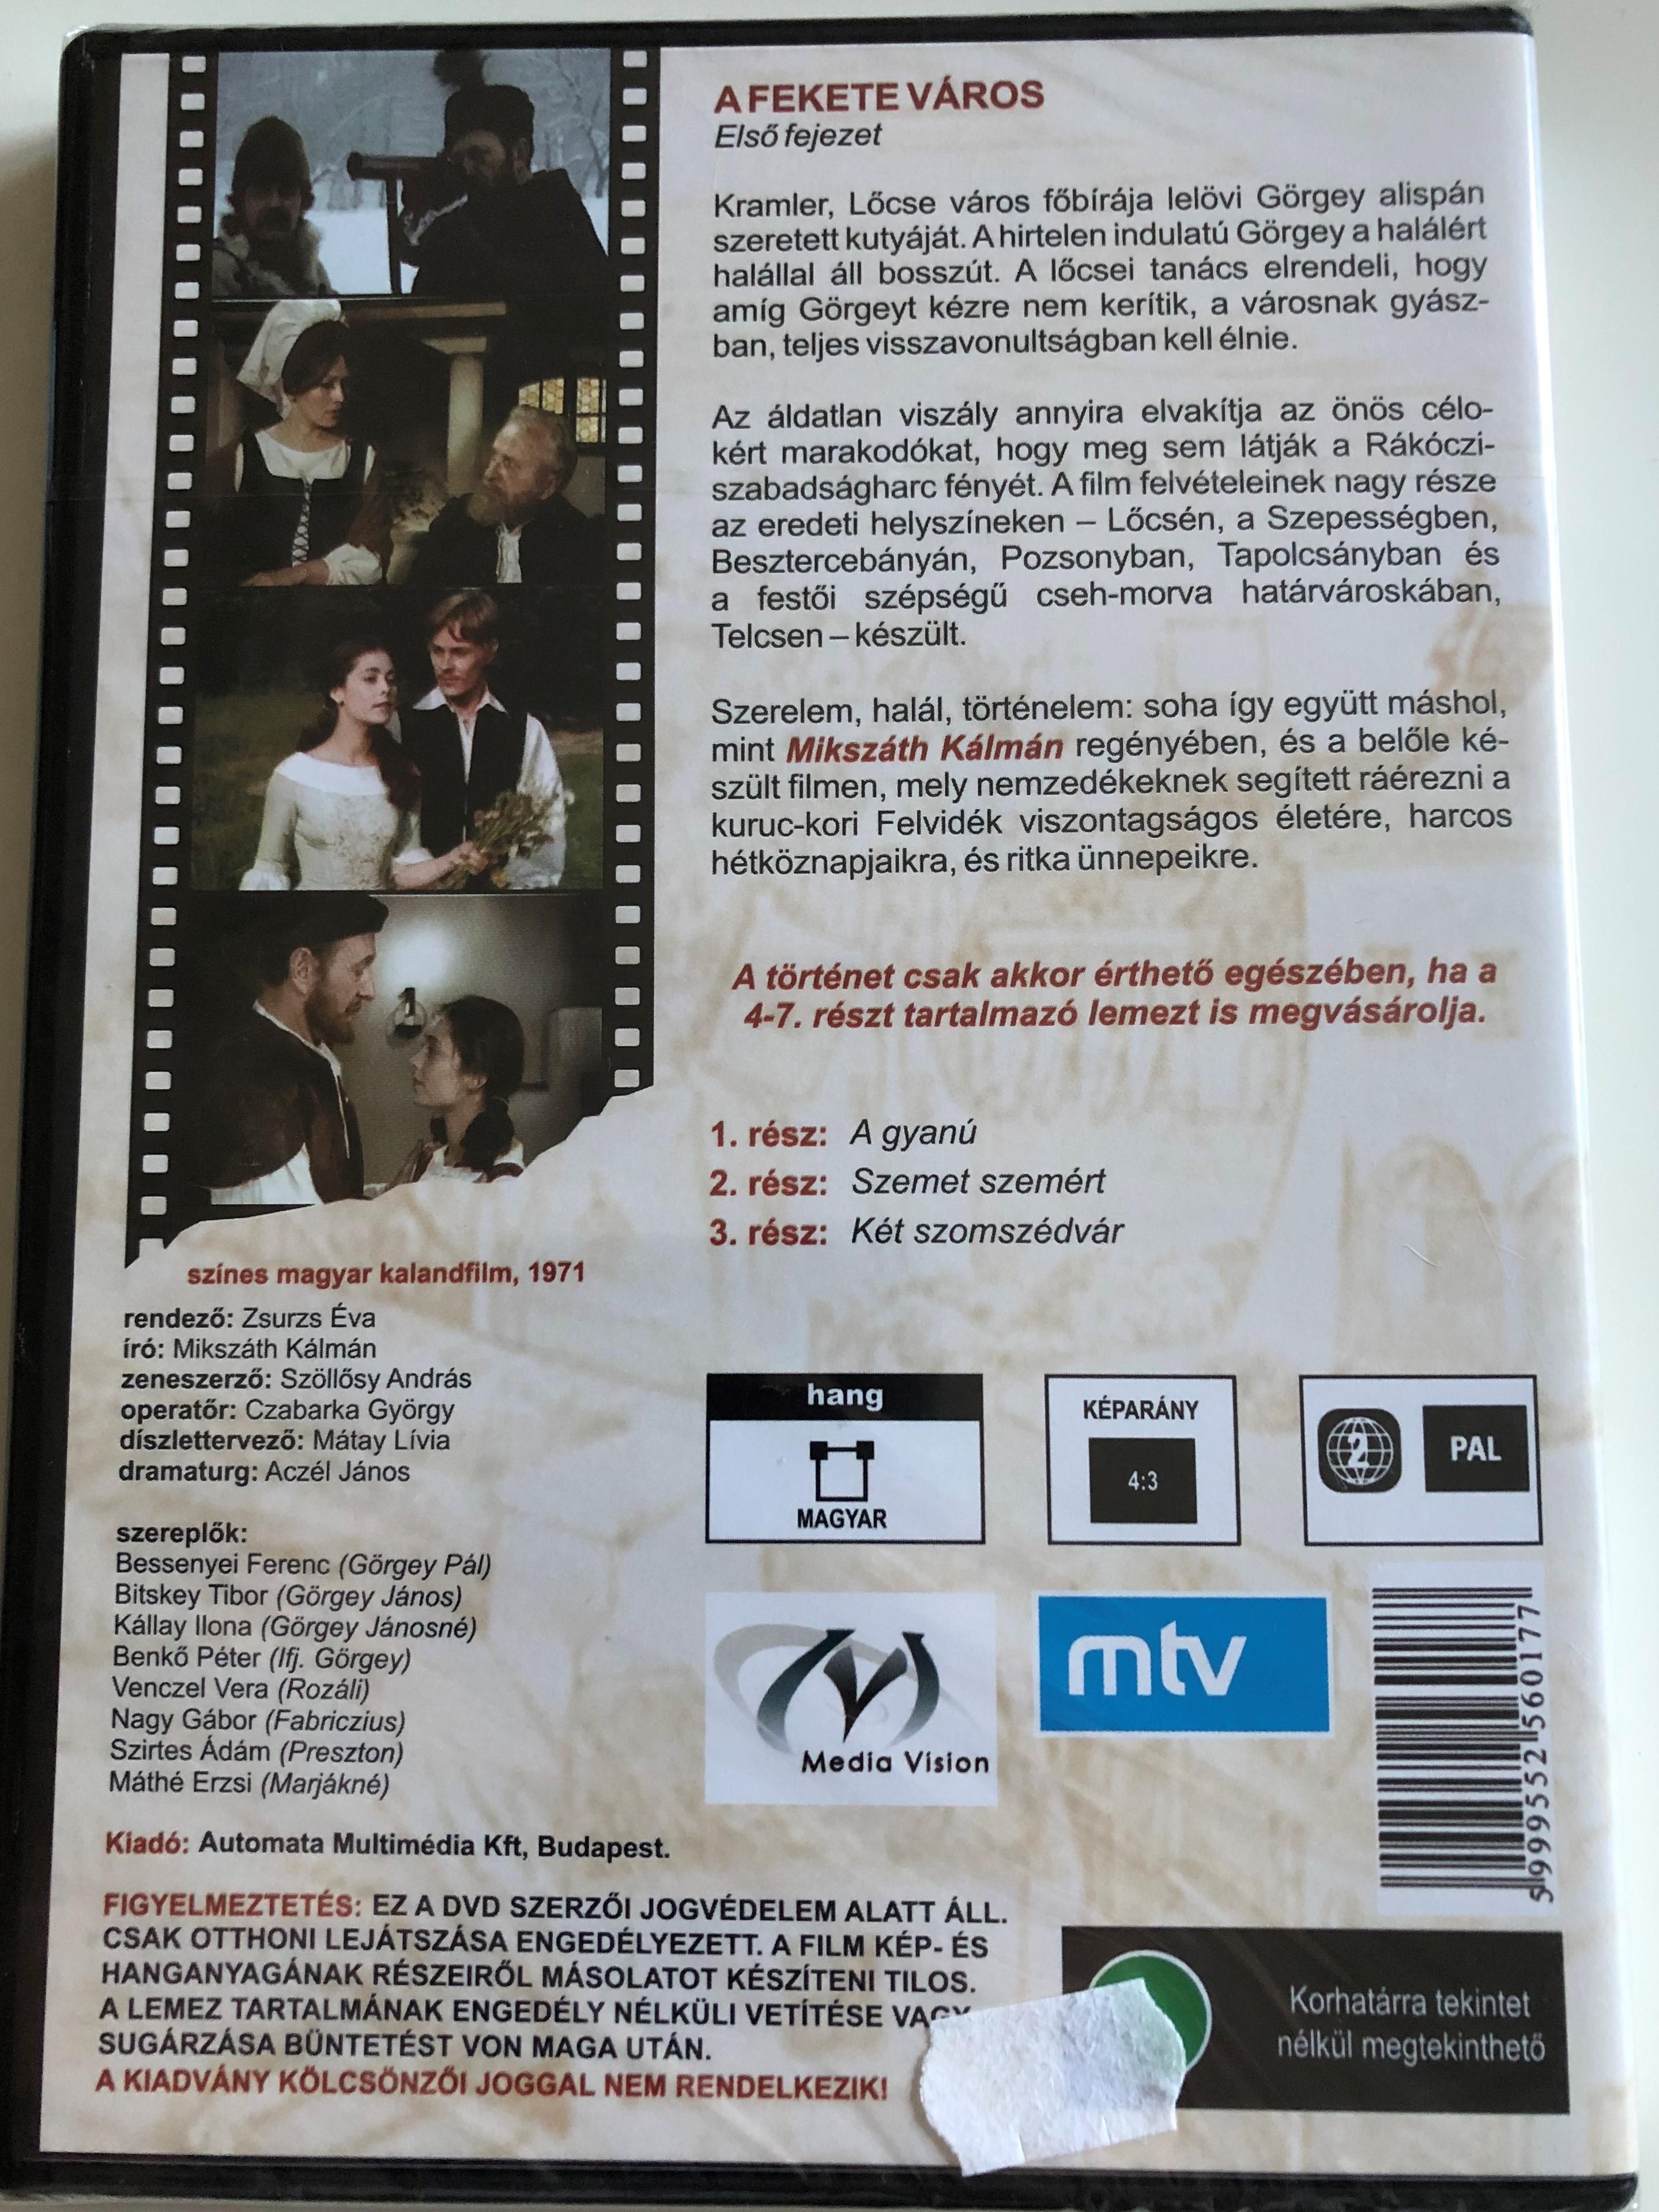 a-fekete-v-ros-i.-dvd-els-fejezet-1-3.r-sz-2.jpg